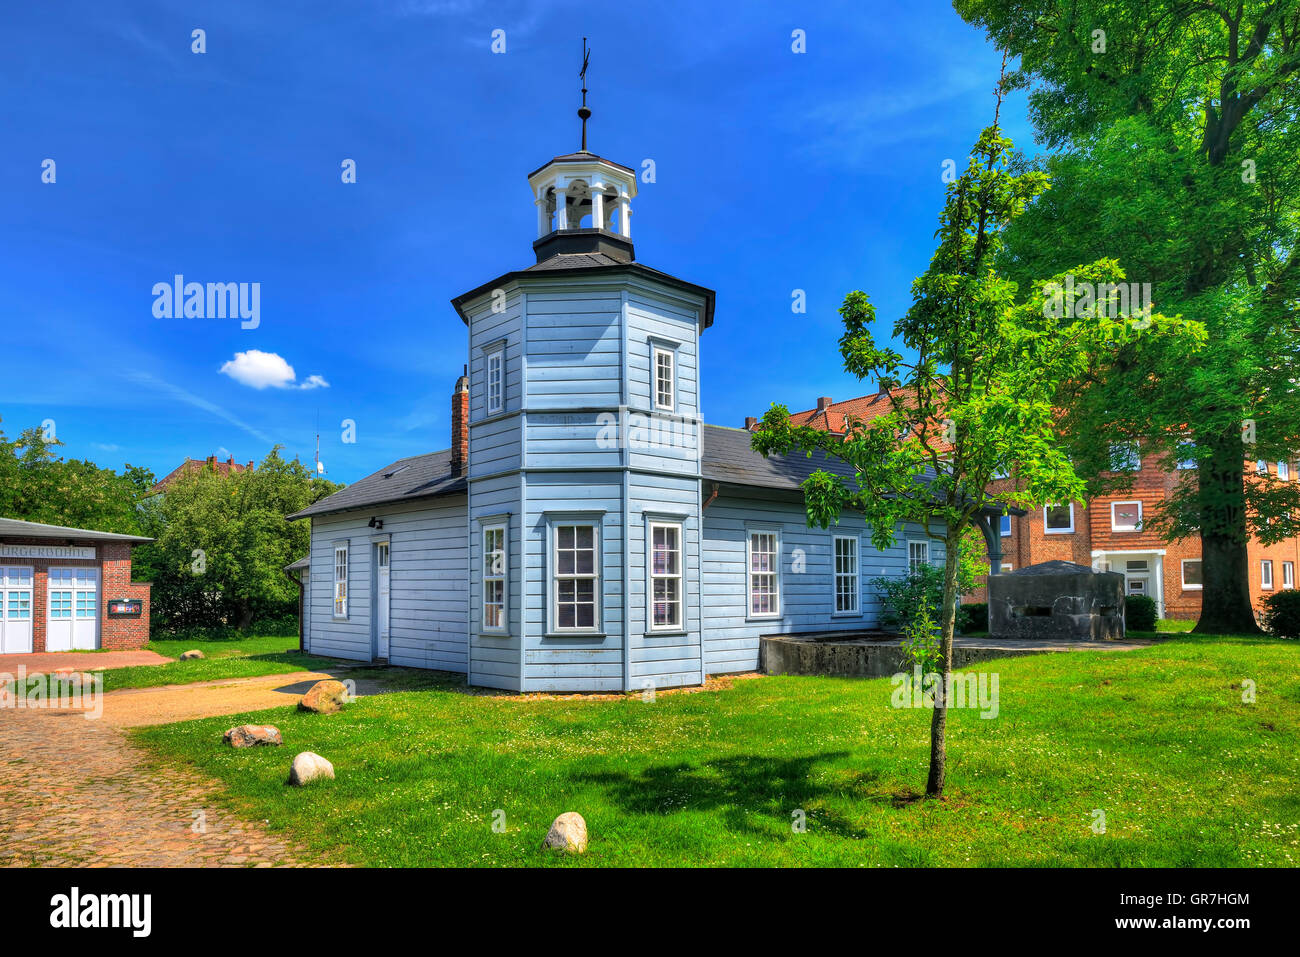 Historical Railway Building In Bergedorf, Hamburg, Germany - Stock Image